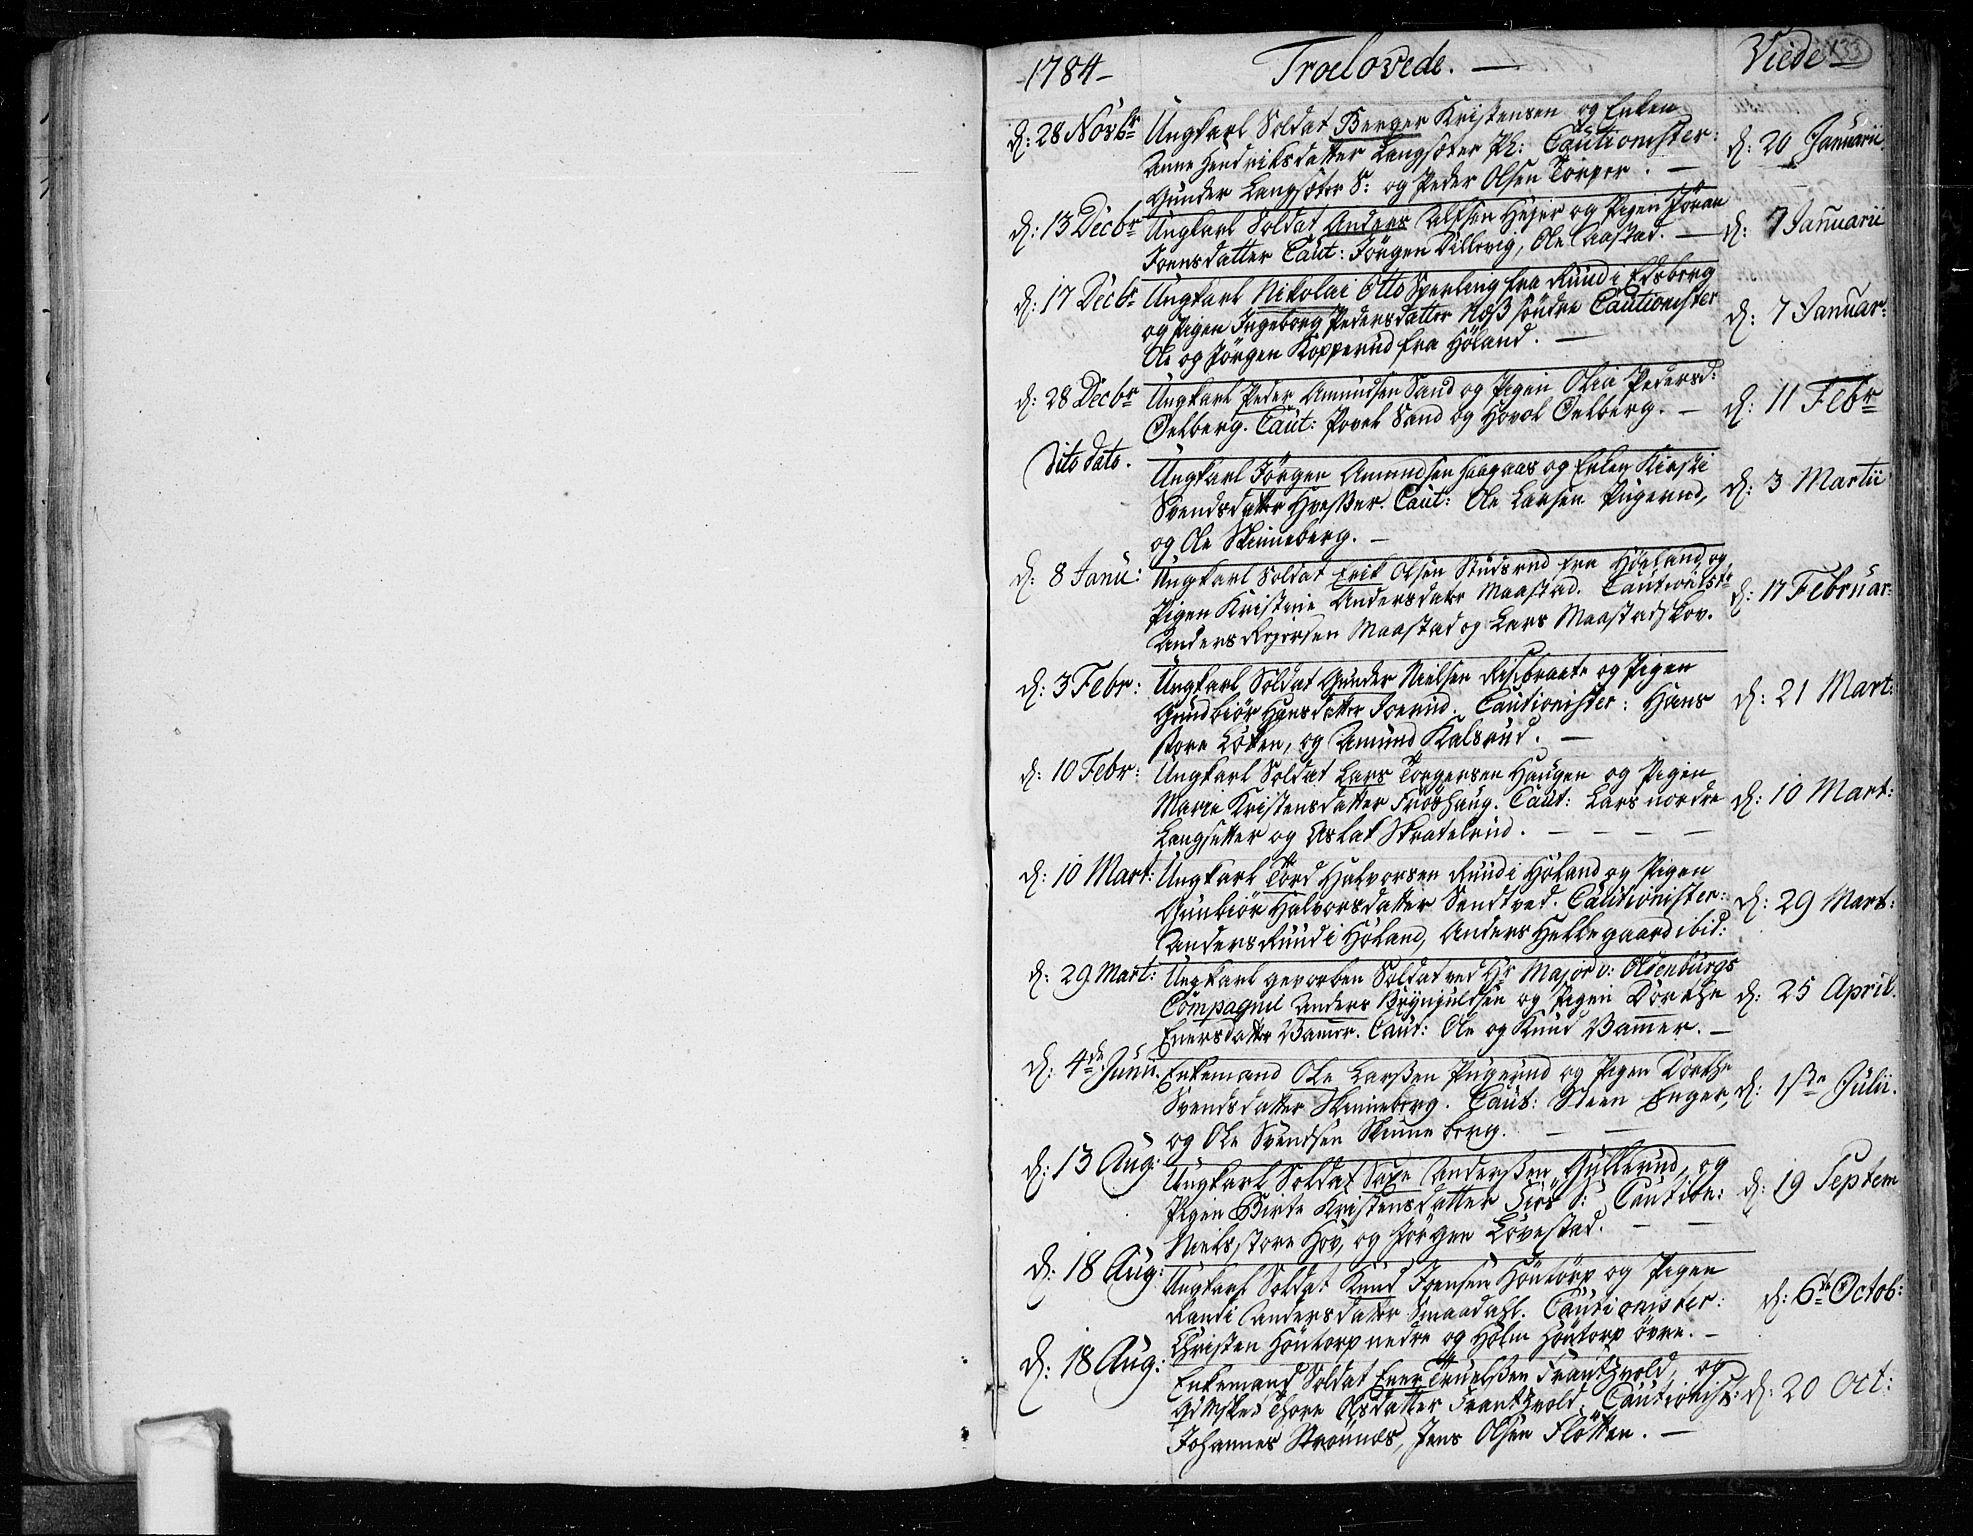 SAO, Trøgstad prestekontor Kirkebøker, F/Fa/L0005: Parish register (official) no. I 5, 1784-1814, p. 133